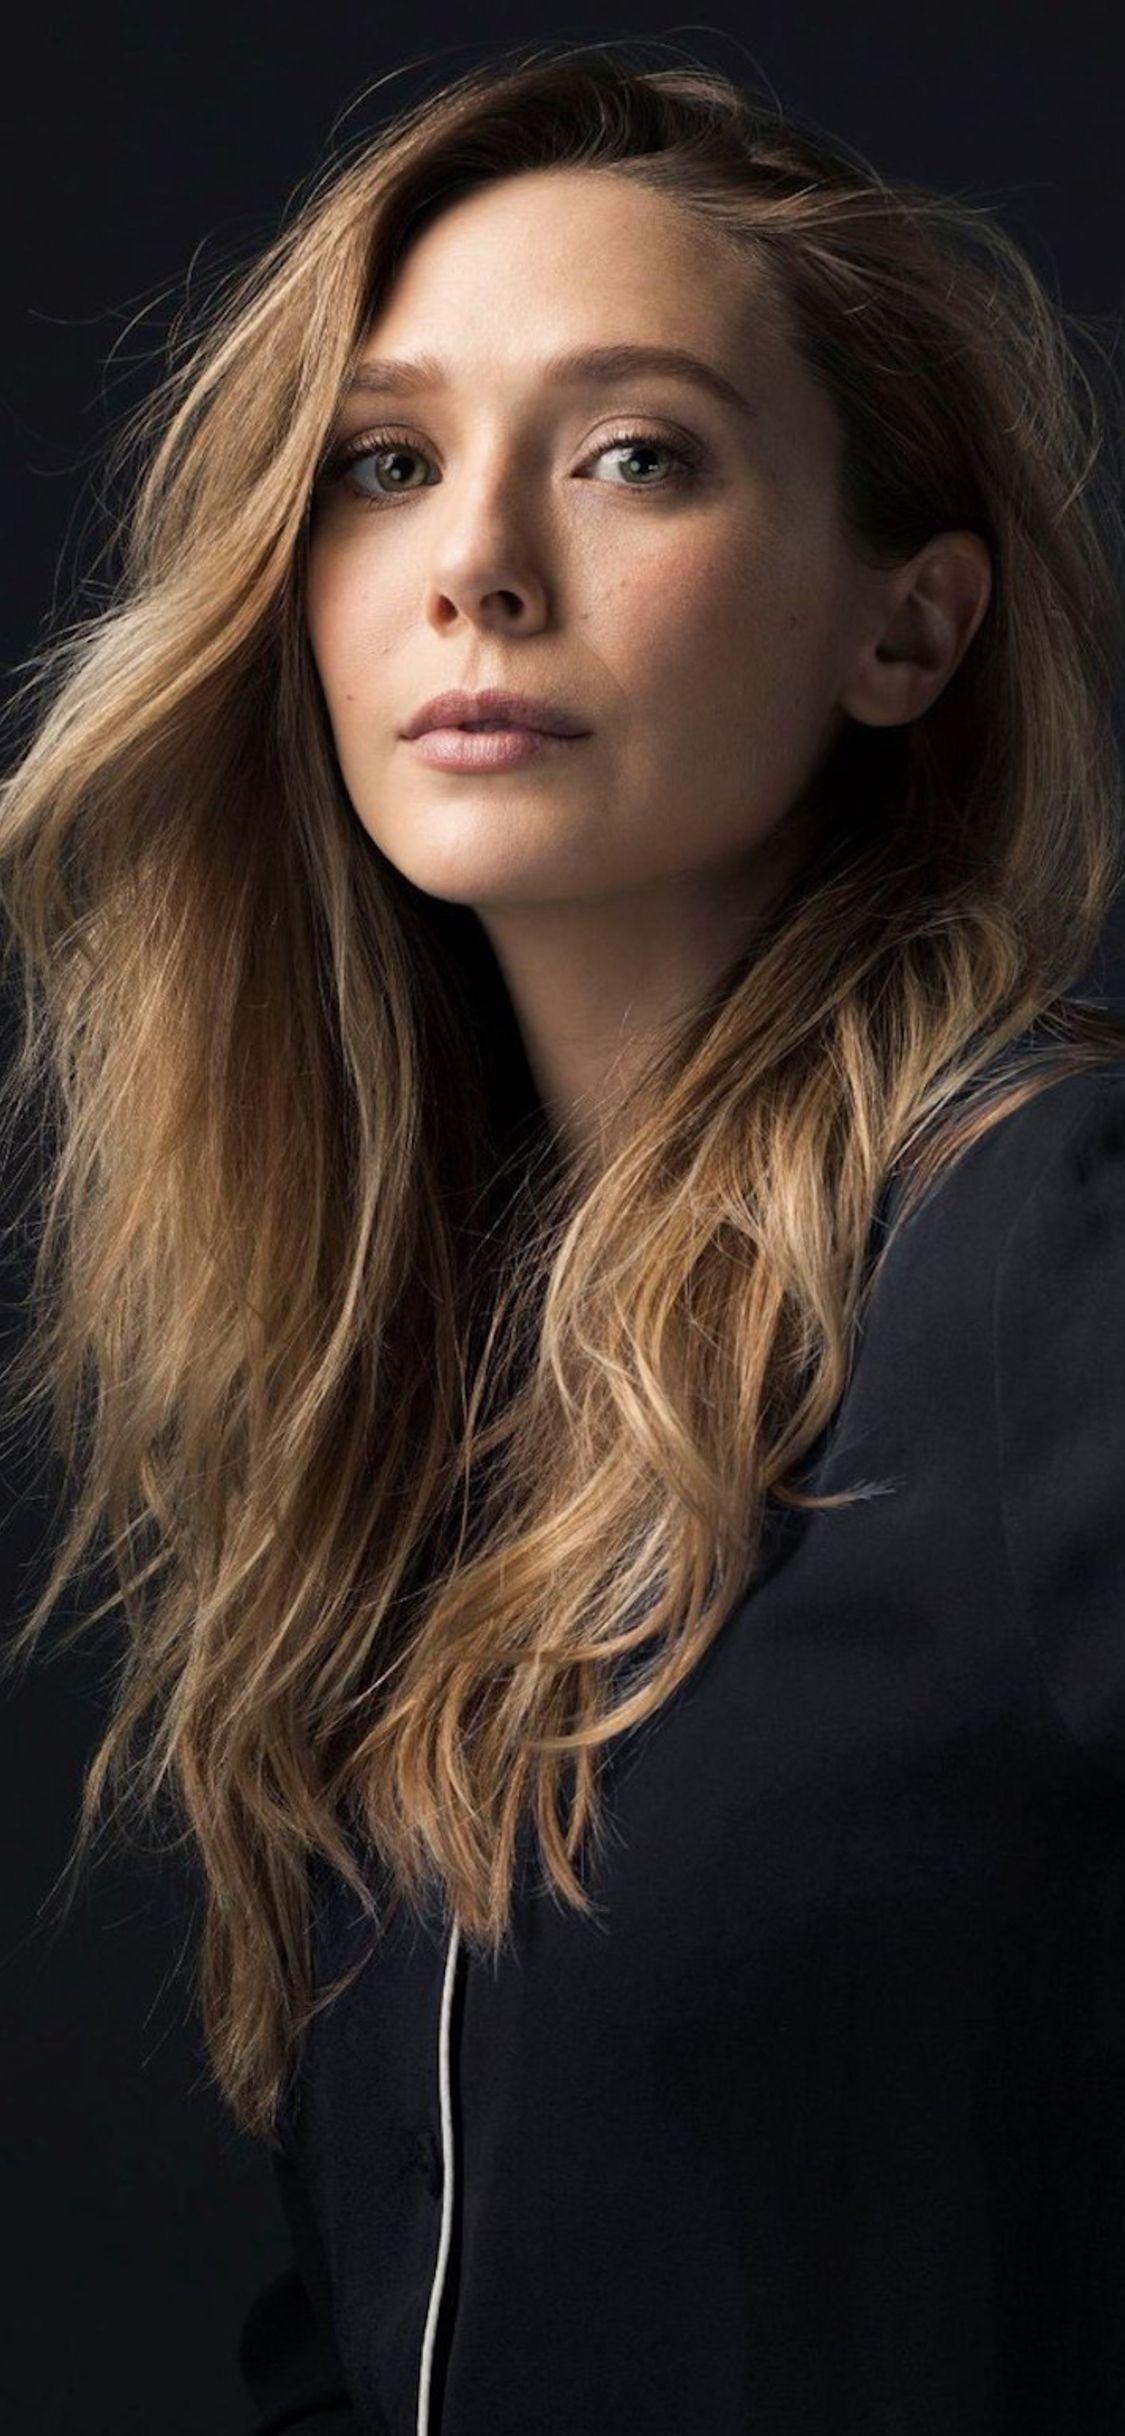 1125x2436 Elizabeth Olsen Celebrity 2018 Iphone Xs Iphone 10